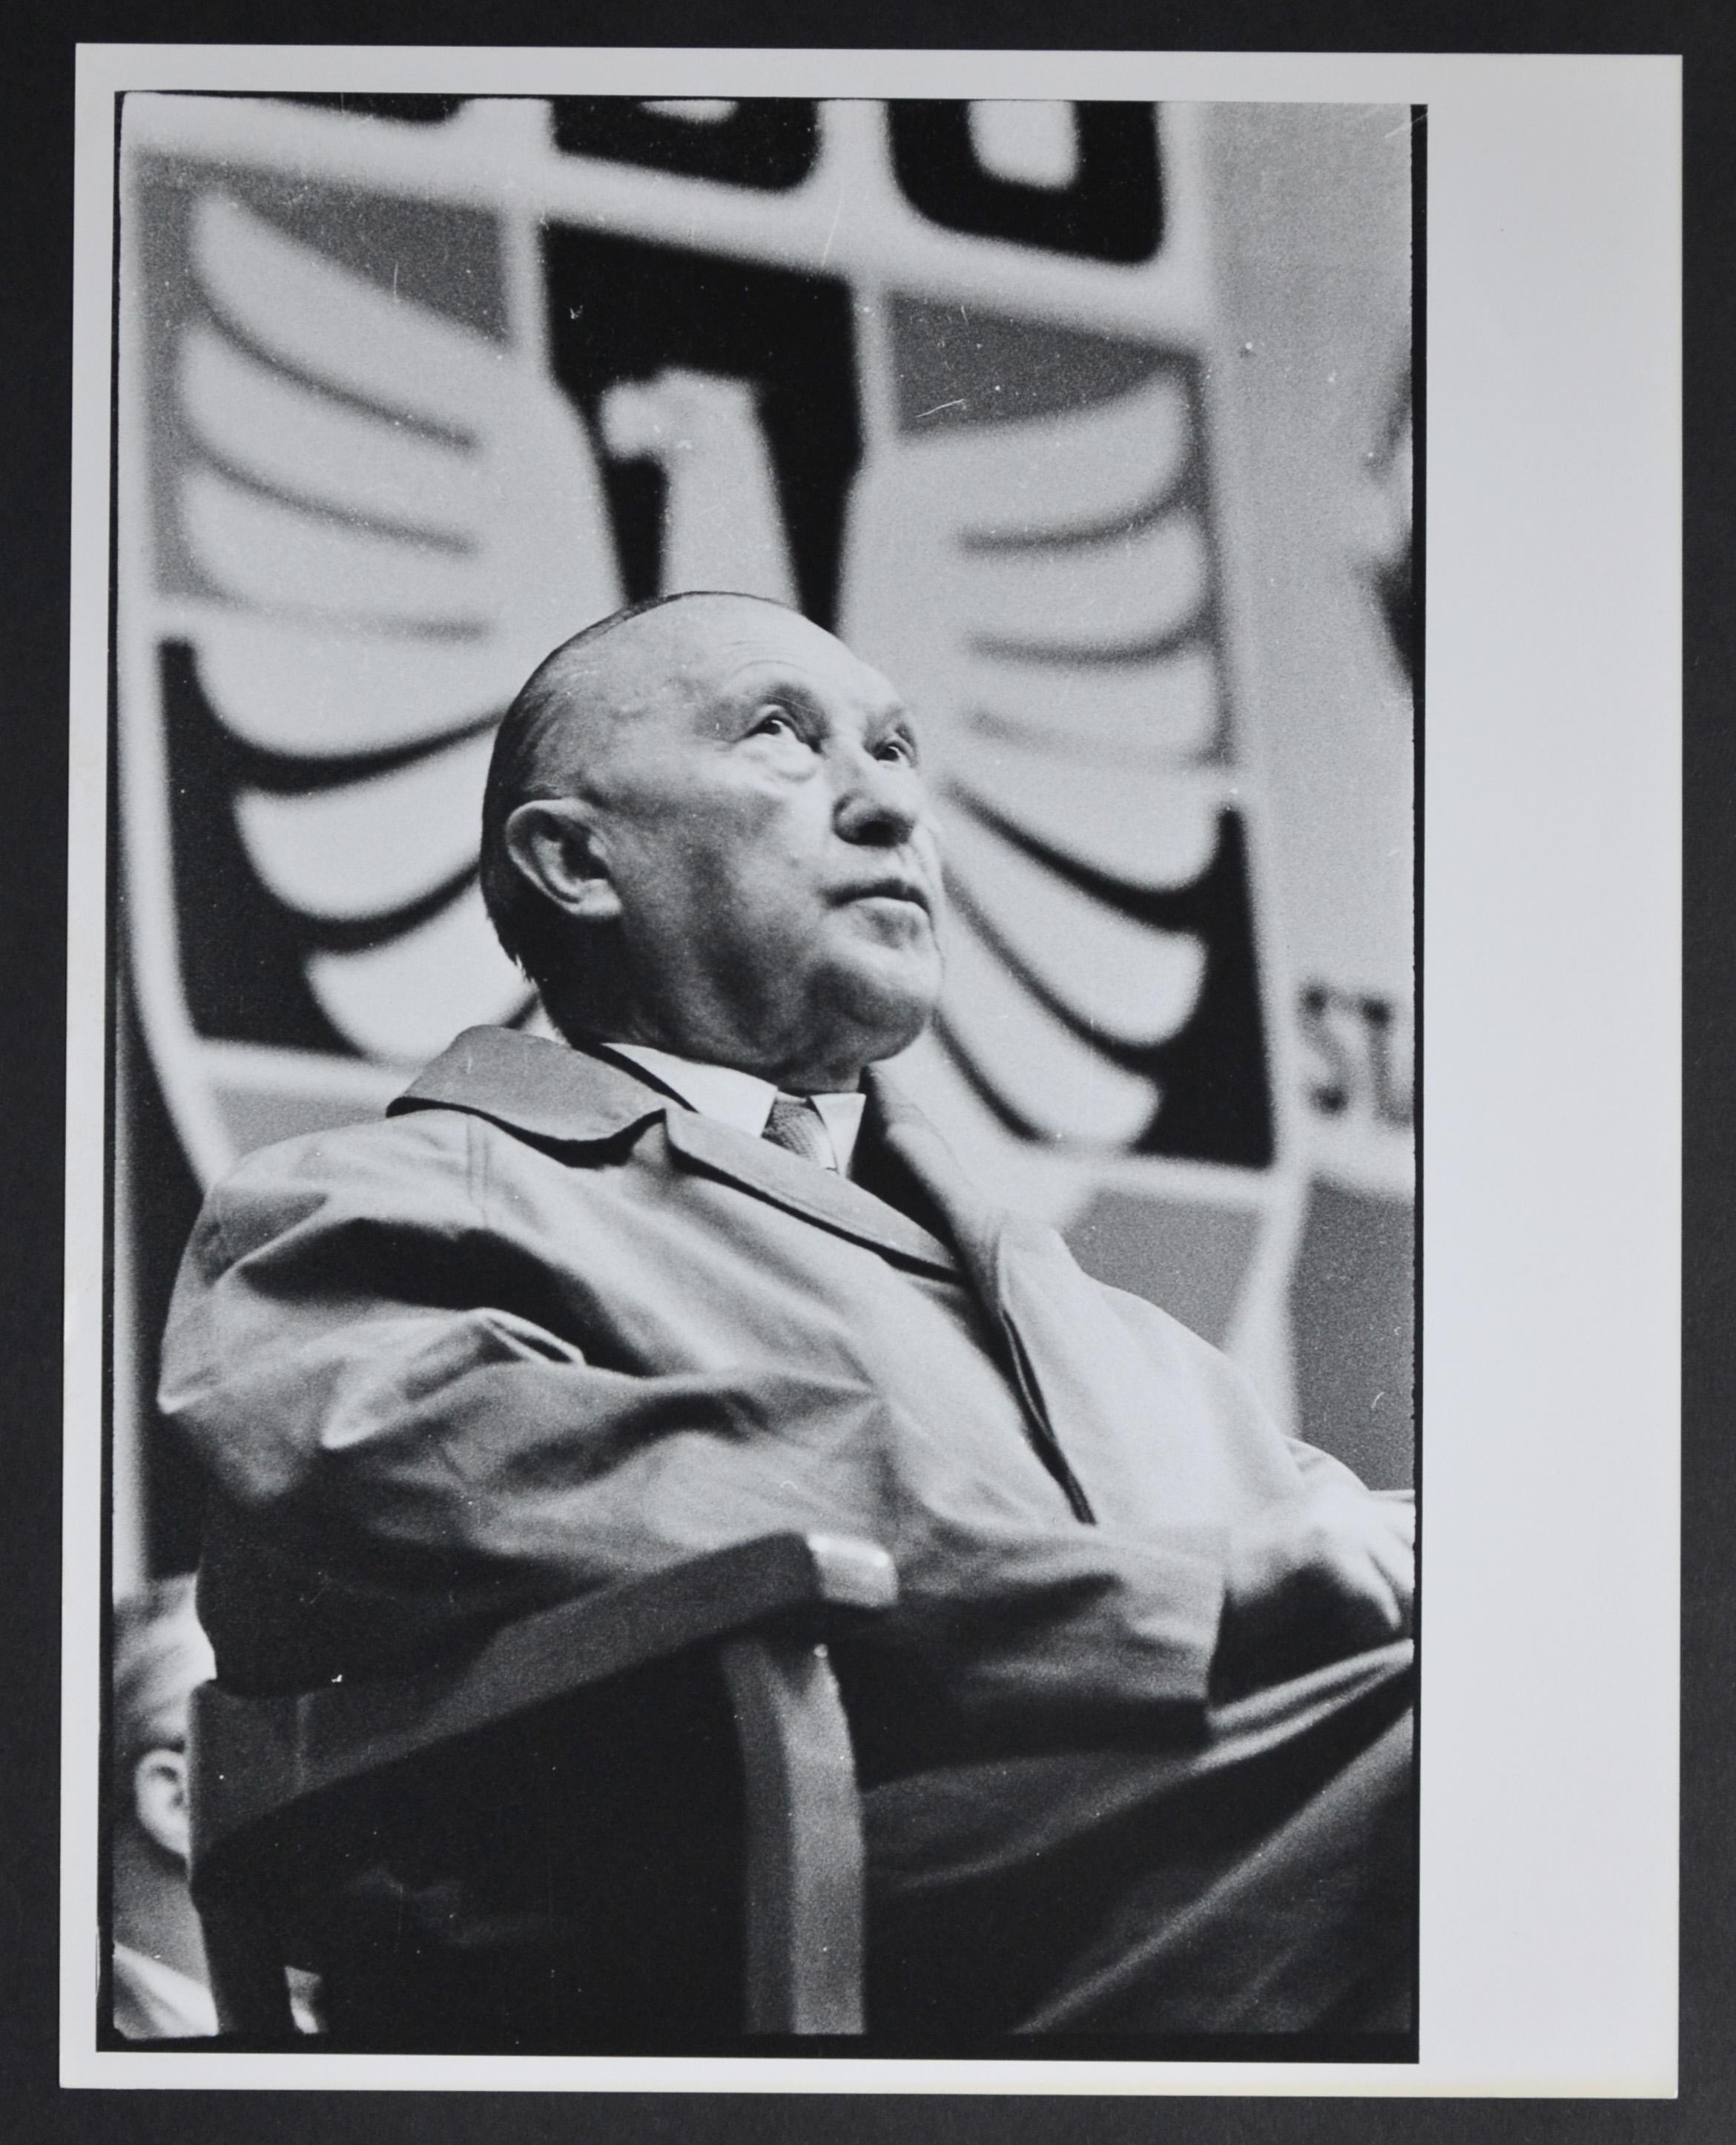 Chancellor Konrad Adenauer sitting, 1950s.